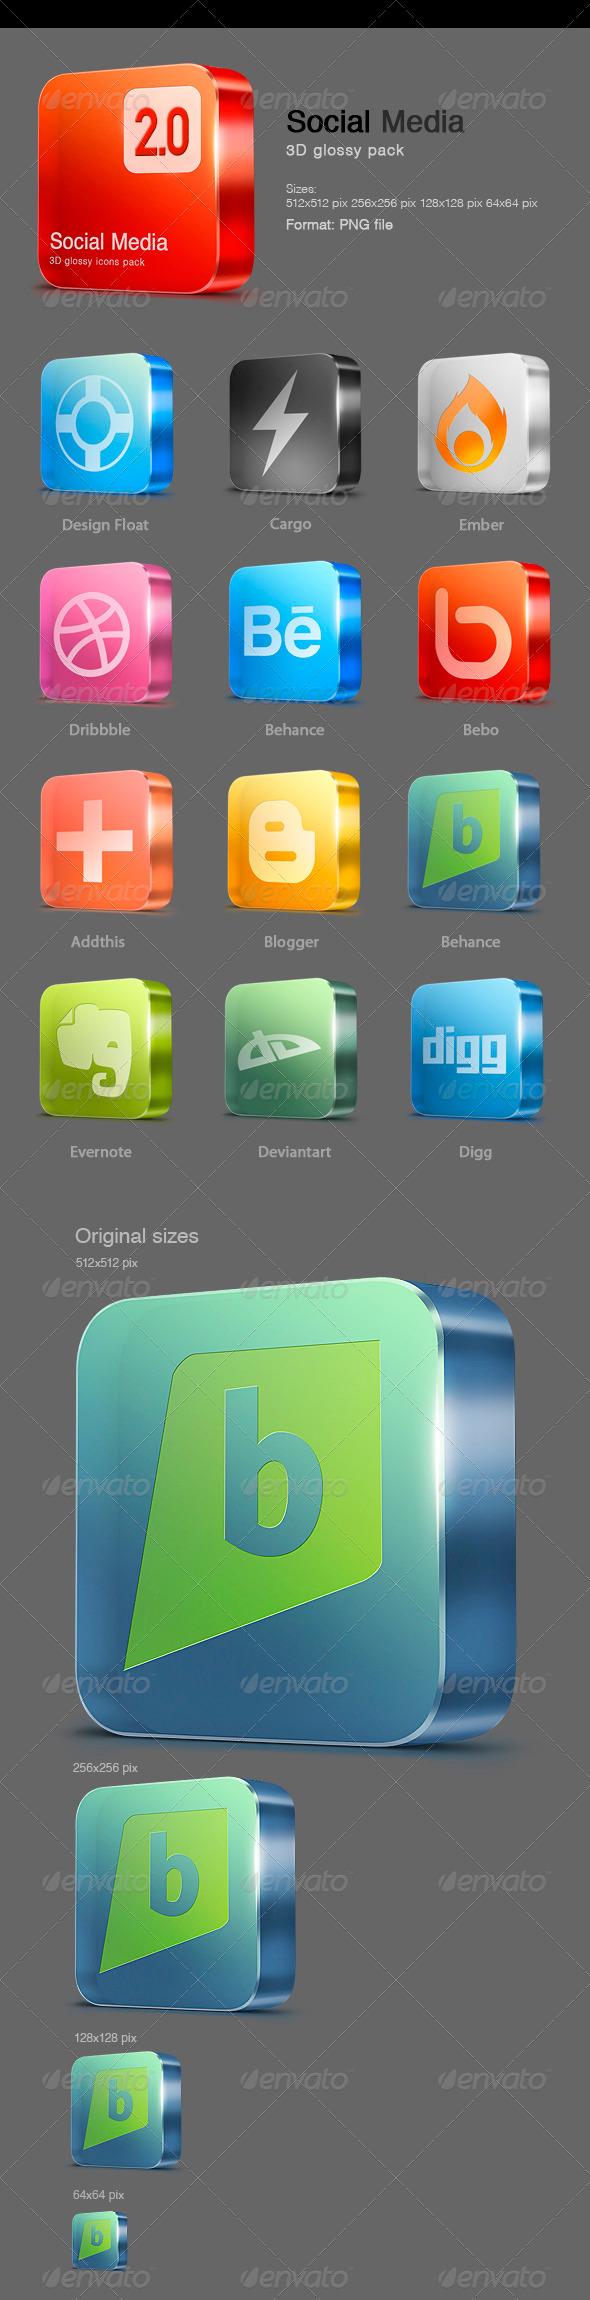 12 Glossy Social Media icons v 2.0 - Web Icons